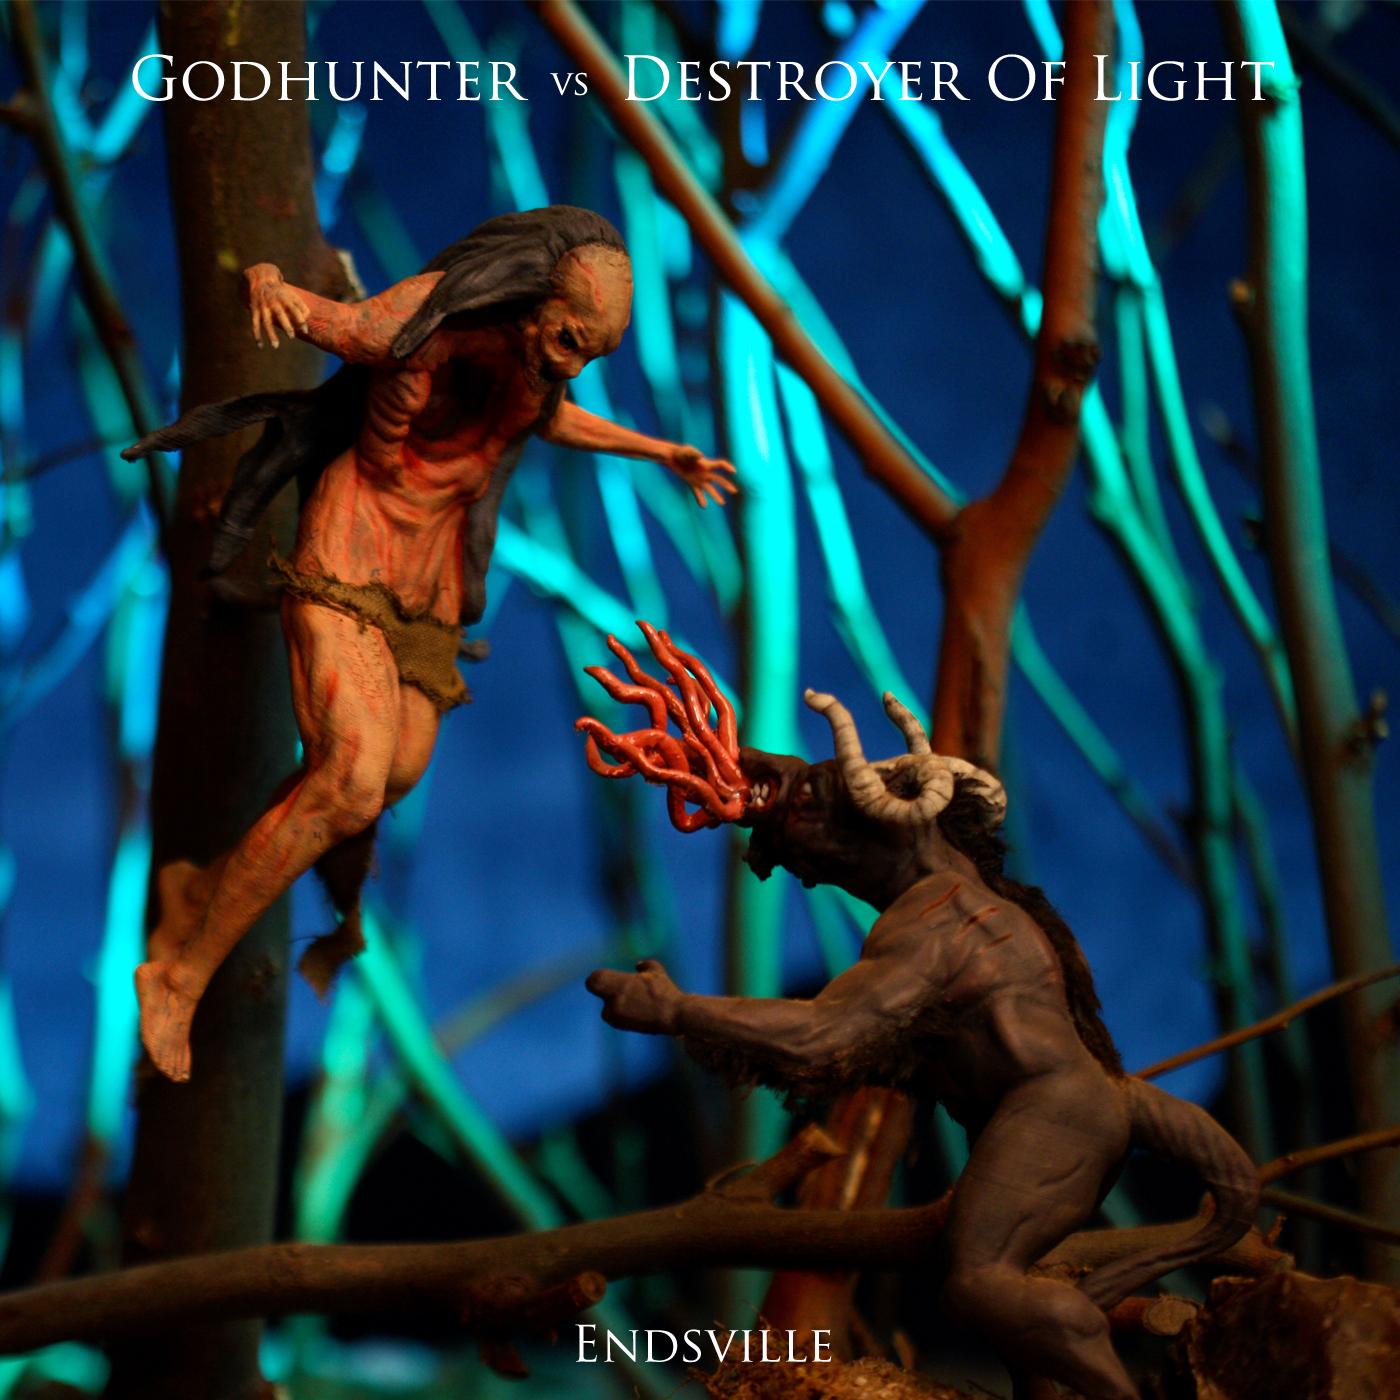 Godhunter/Destroyer of Light – Endsville Review